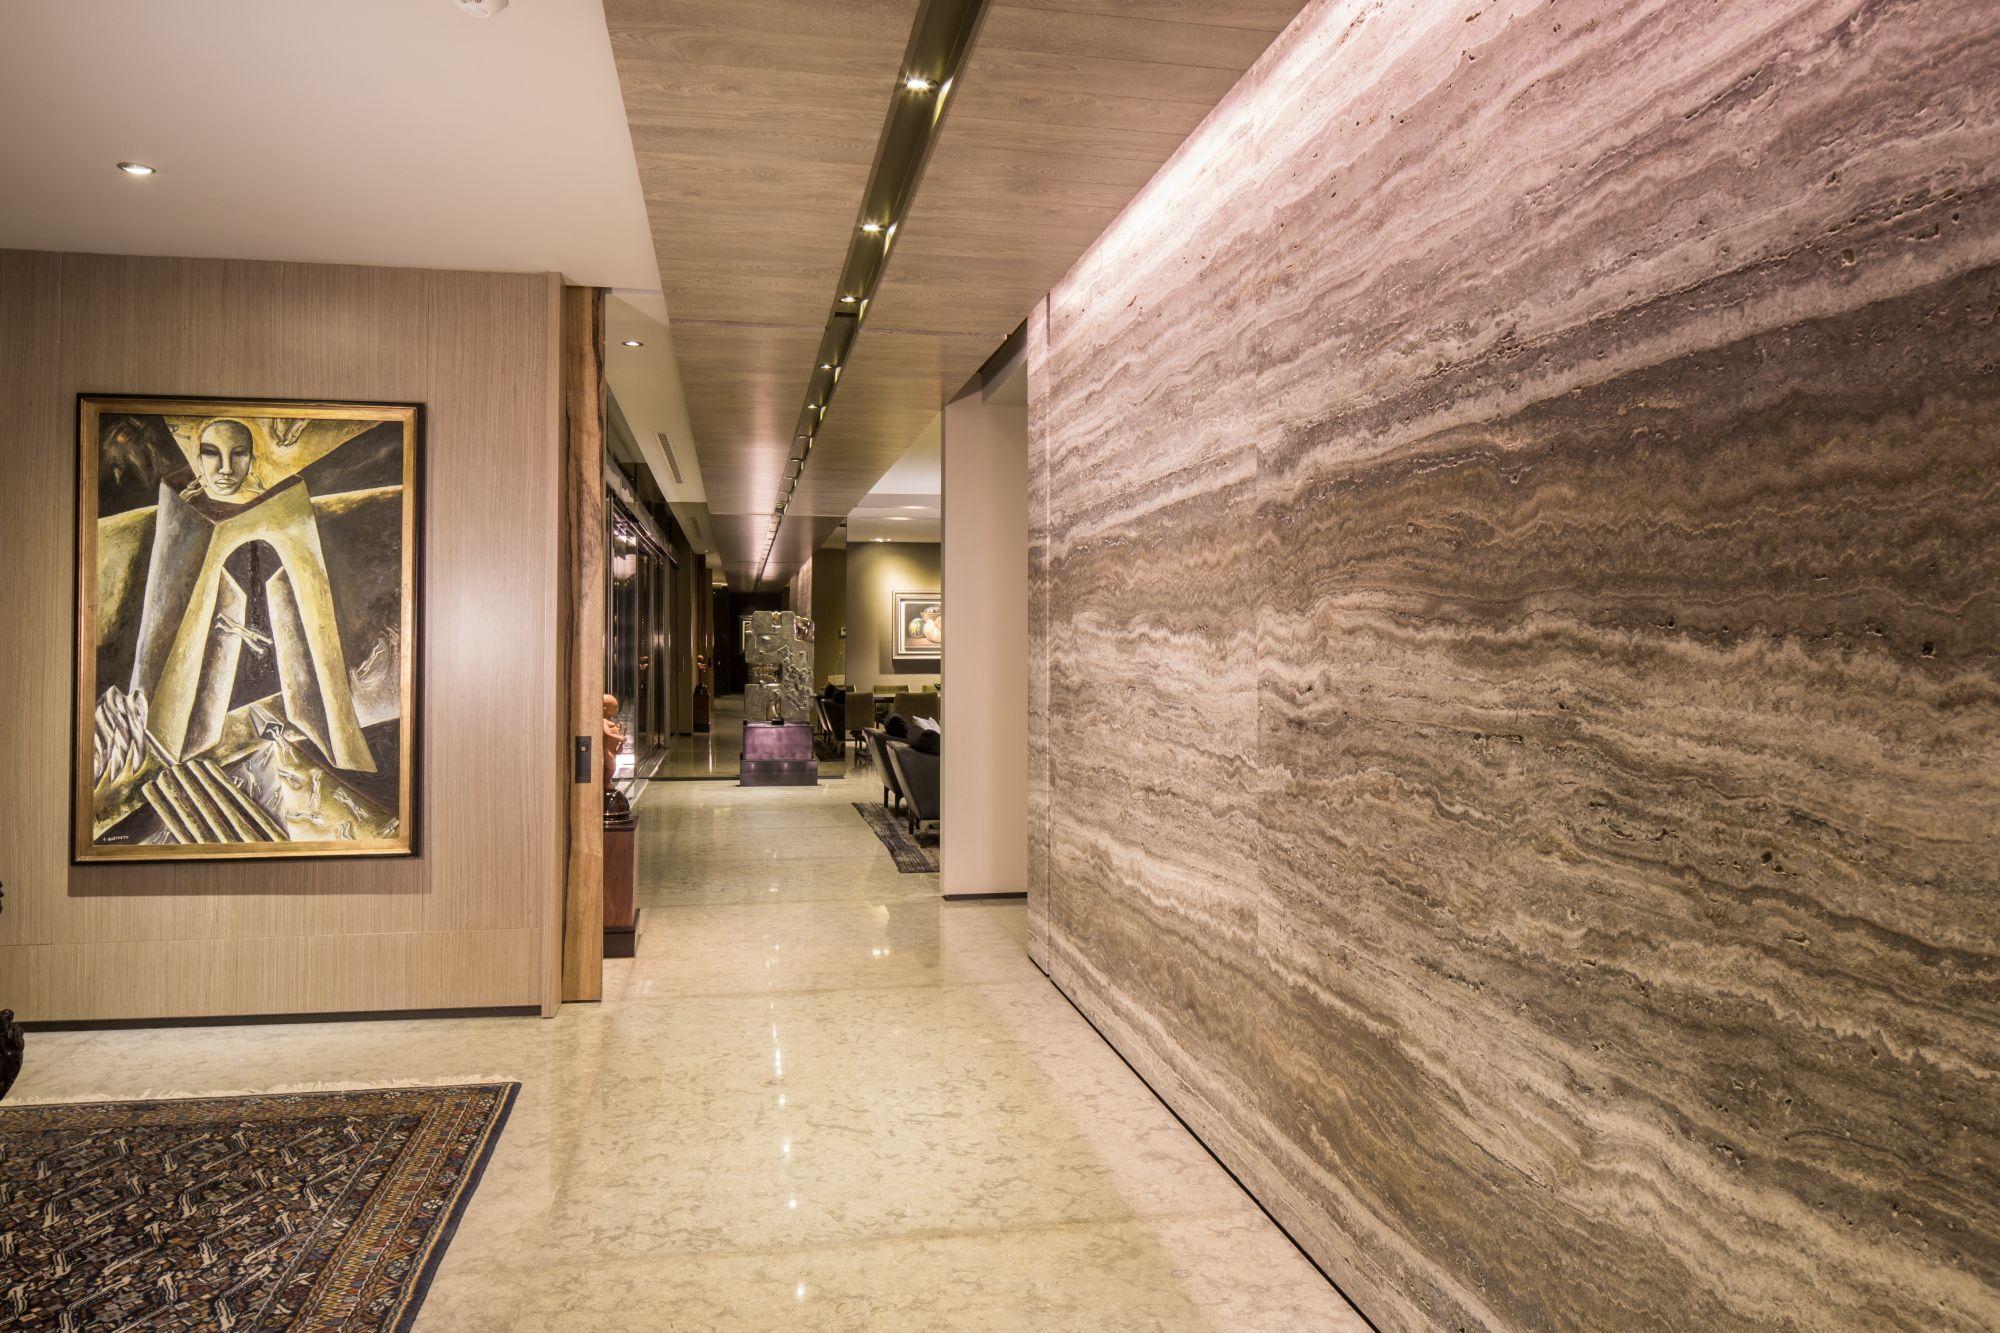 Detalle de plafón, mármol en lobby de Penthouse por Ana Landa de Línea Vertical www.linea-vertical.com